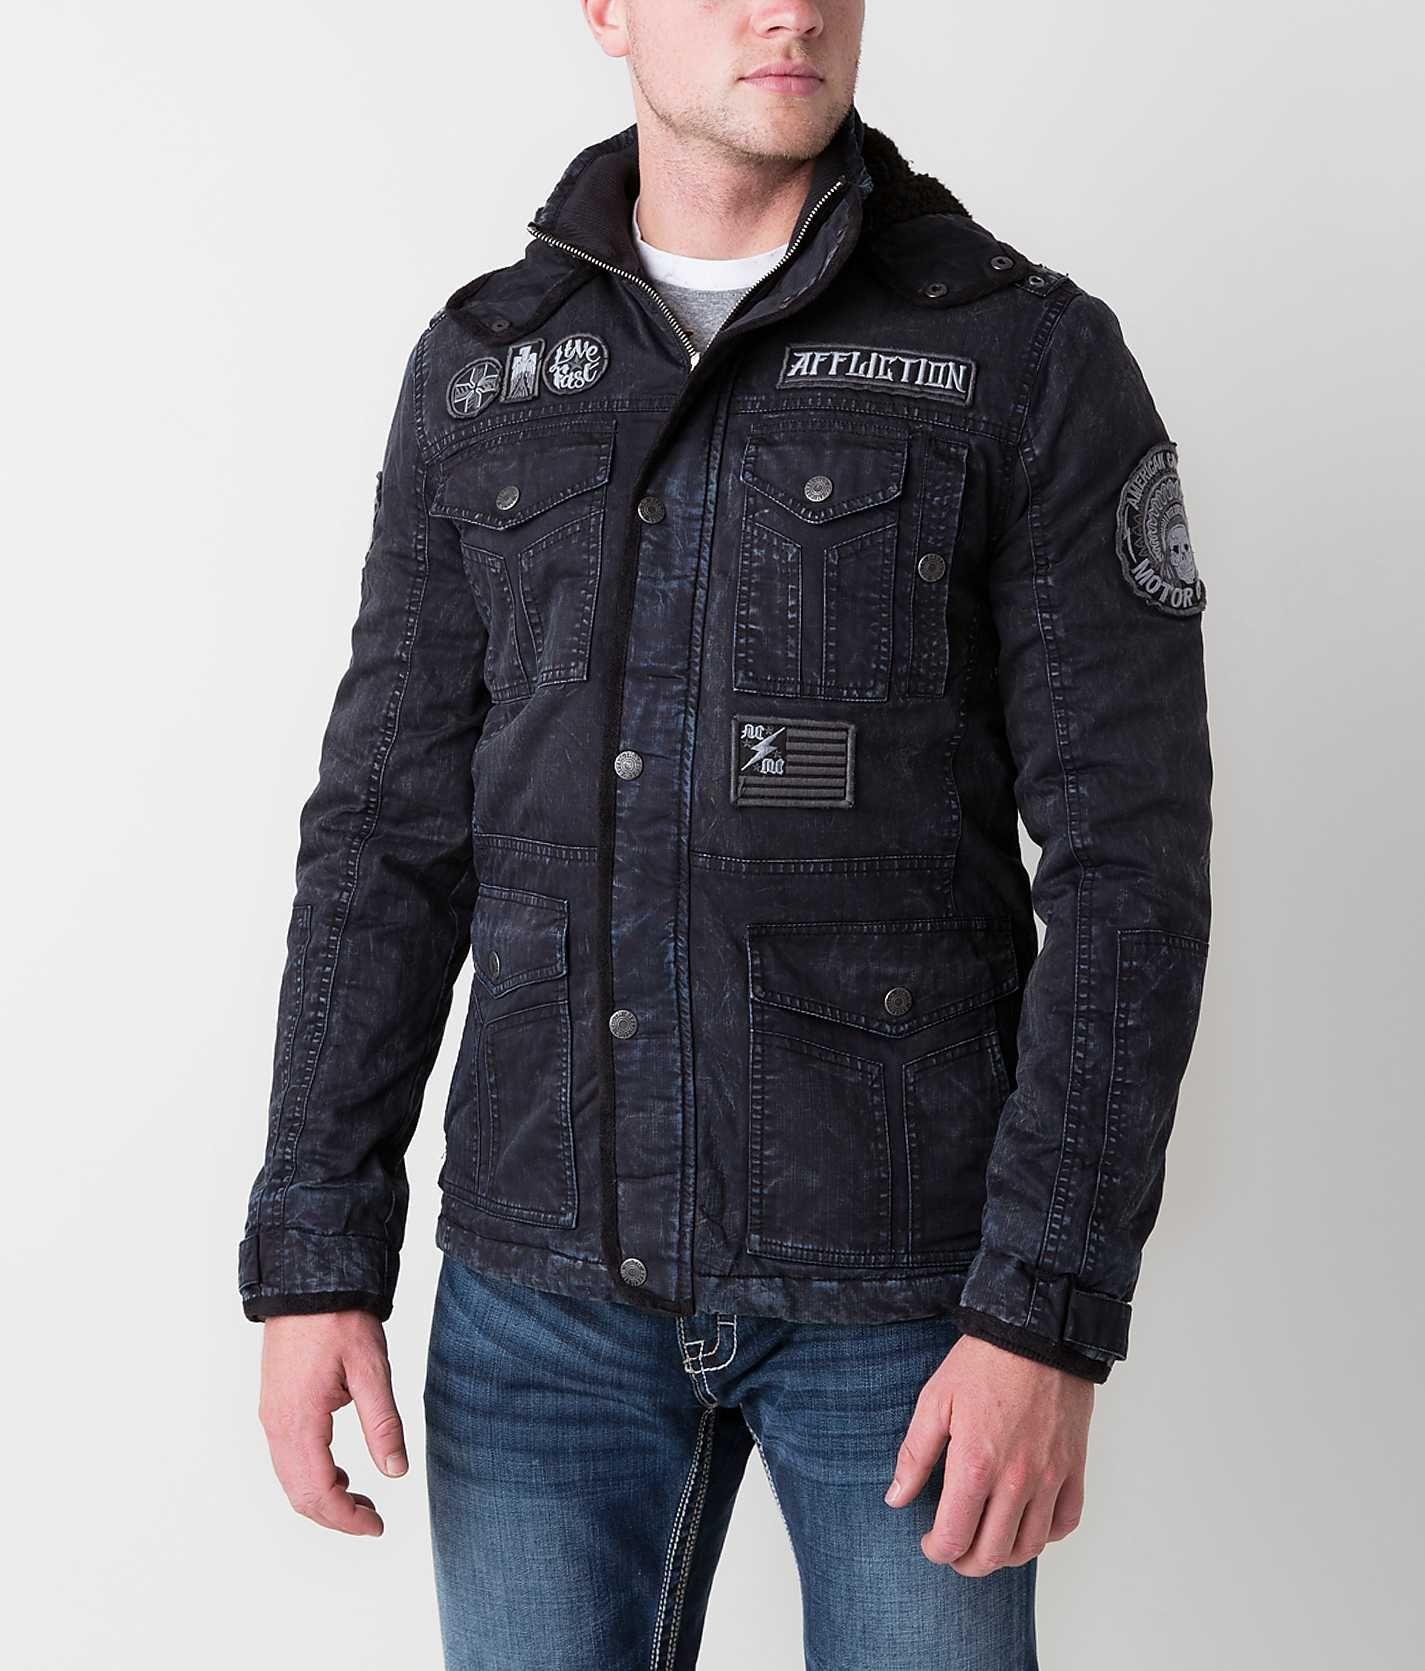 Affliction Black Premium Hysteria Jacket Men's Outerwear